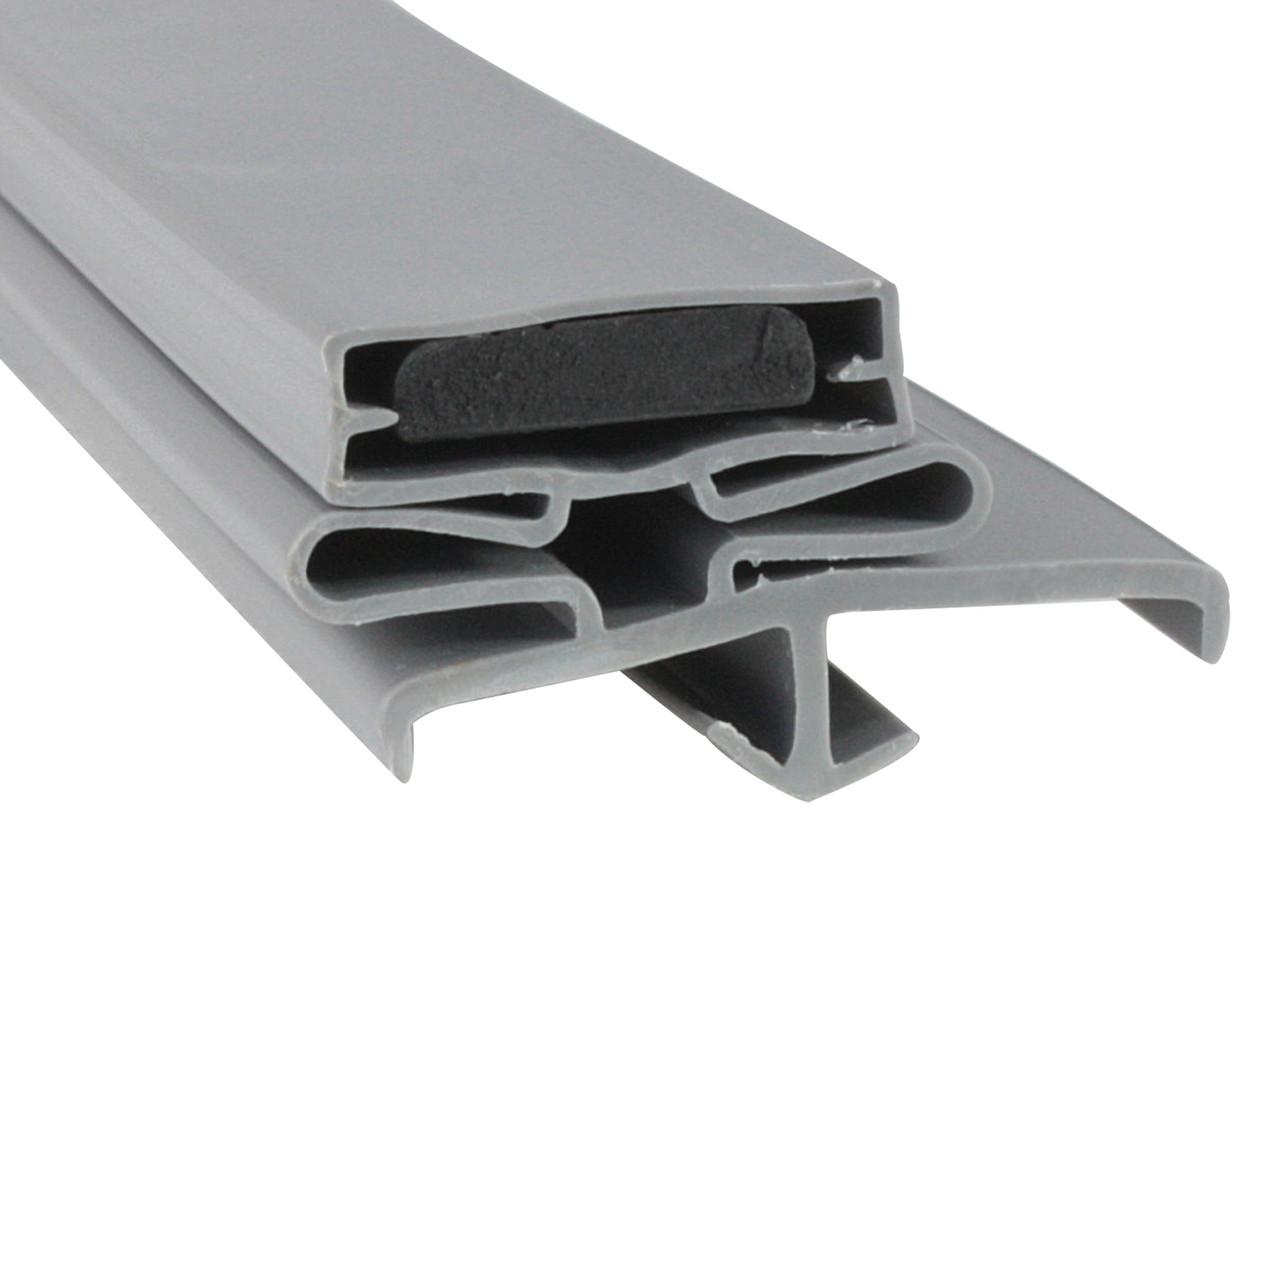 Delfield Door Gasket Profile 168 20 1/2 x 29 -A2.0865, 1702262